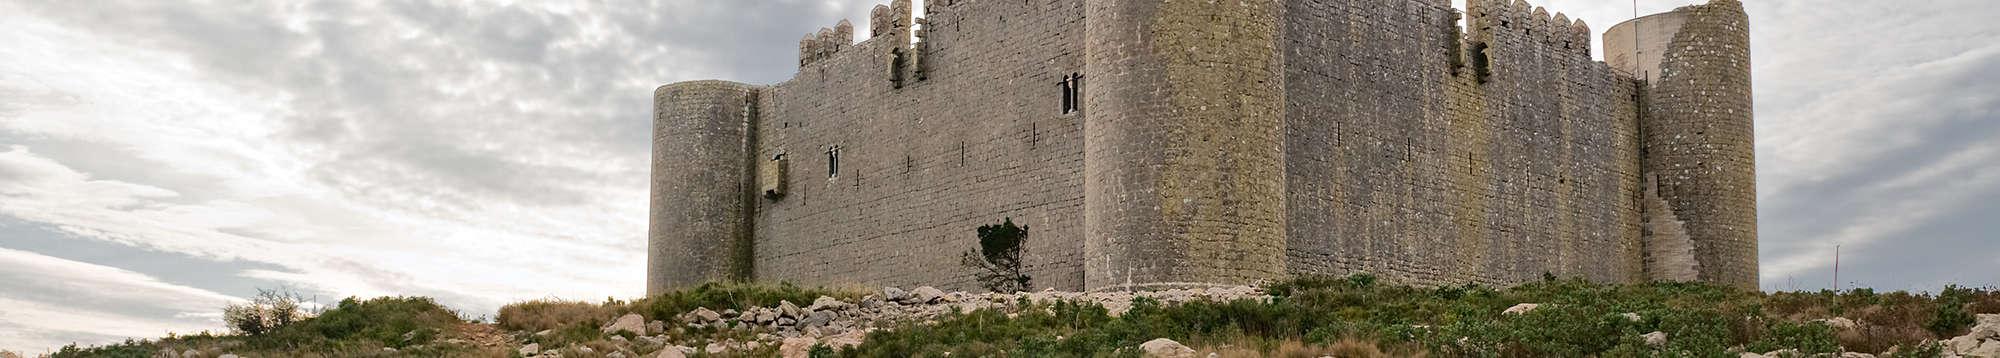 Escapadas fin de semana en Torroella de Montgrí